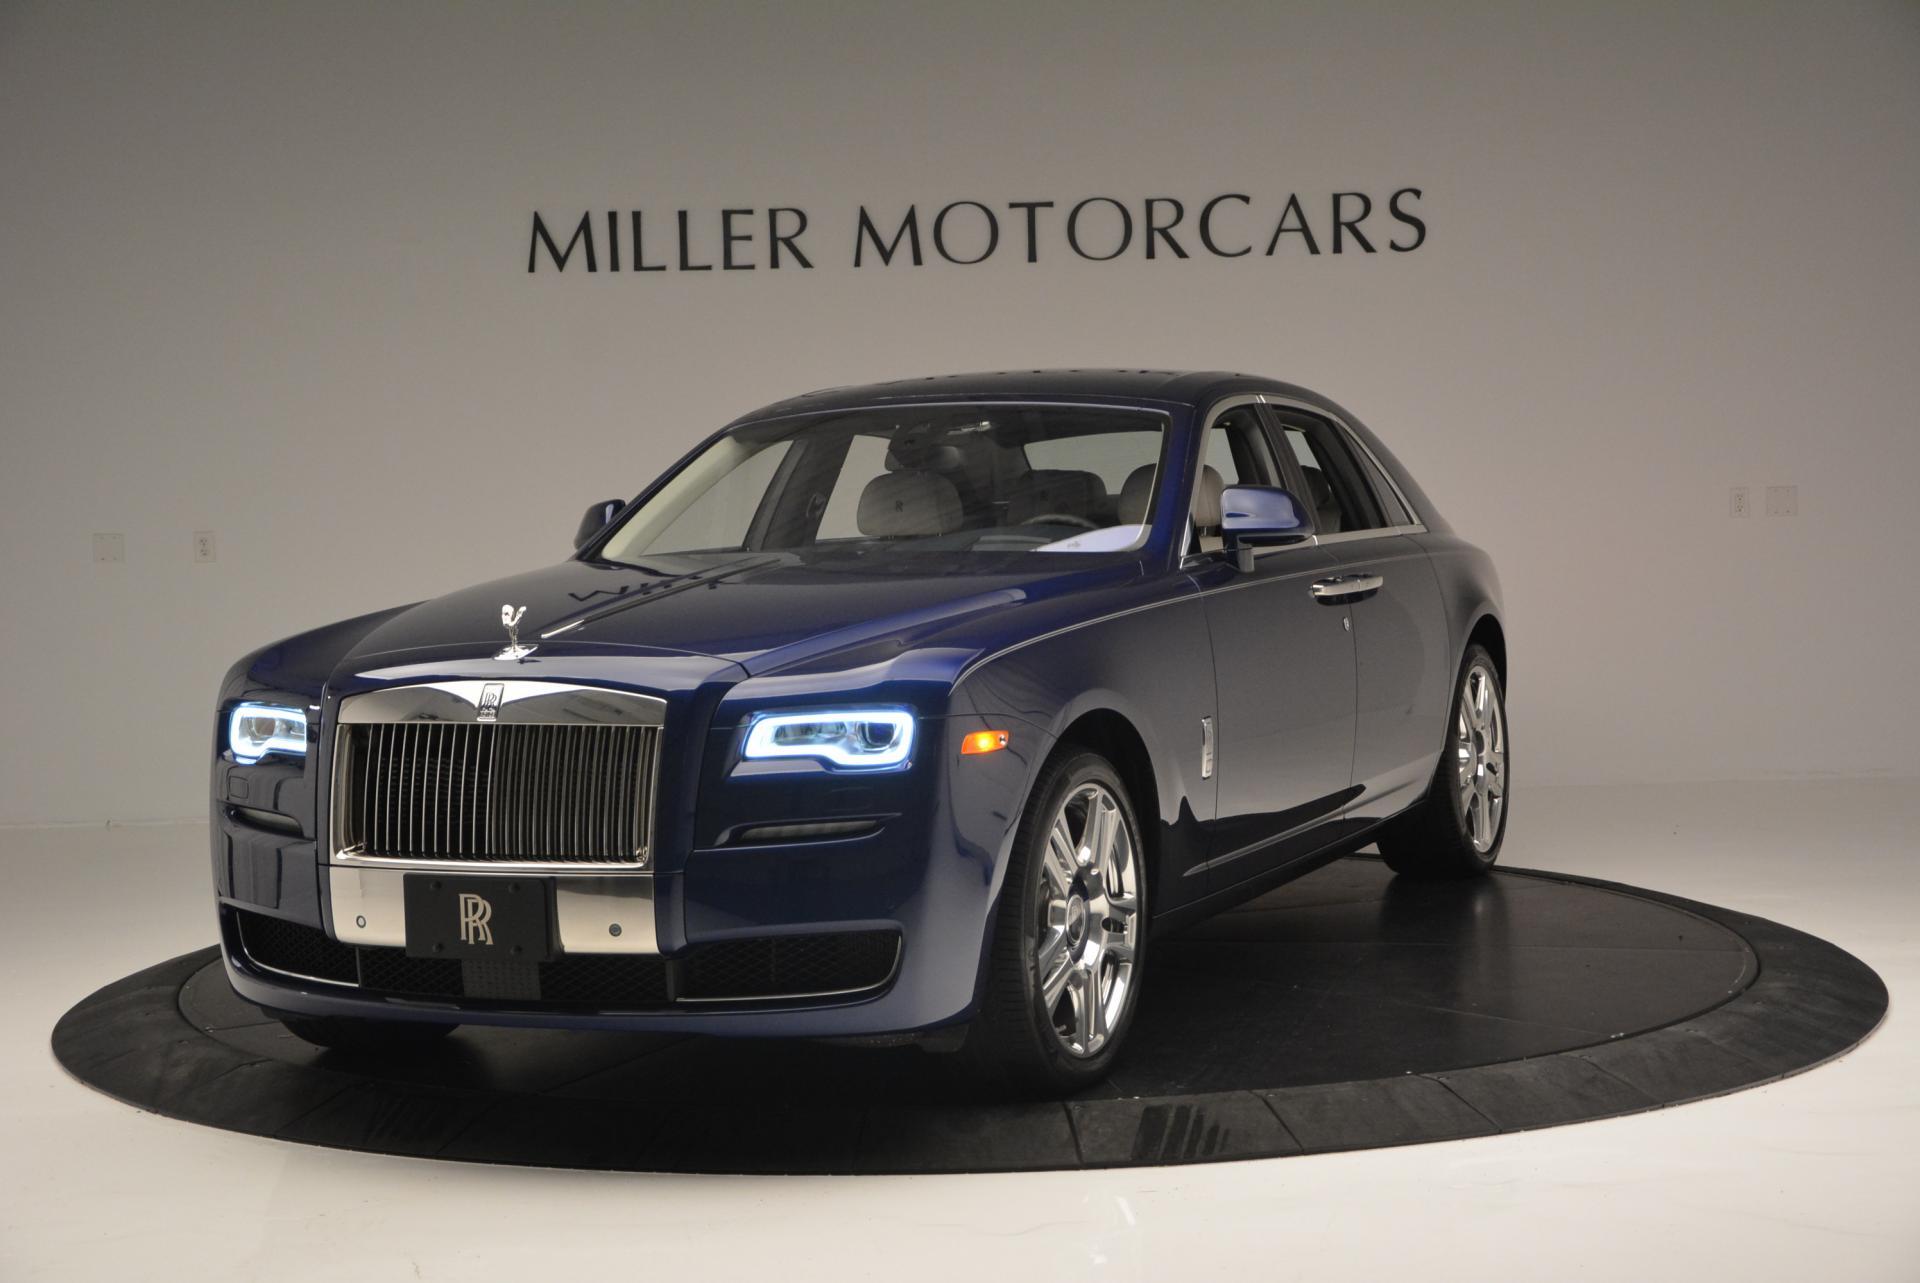 New 2016 Rolls-Royce Ghost Series II  For Sale In Greenwich, CT 223_main